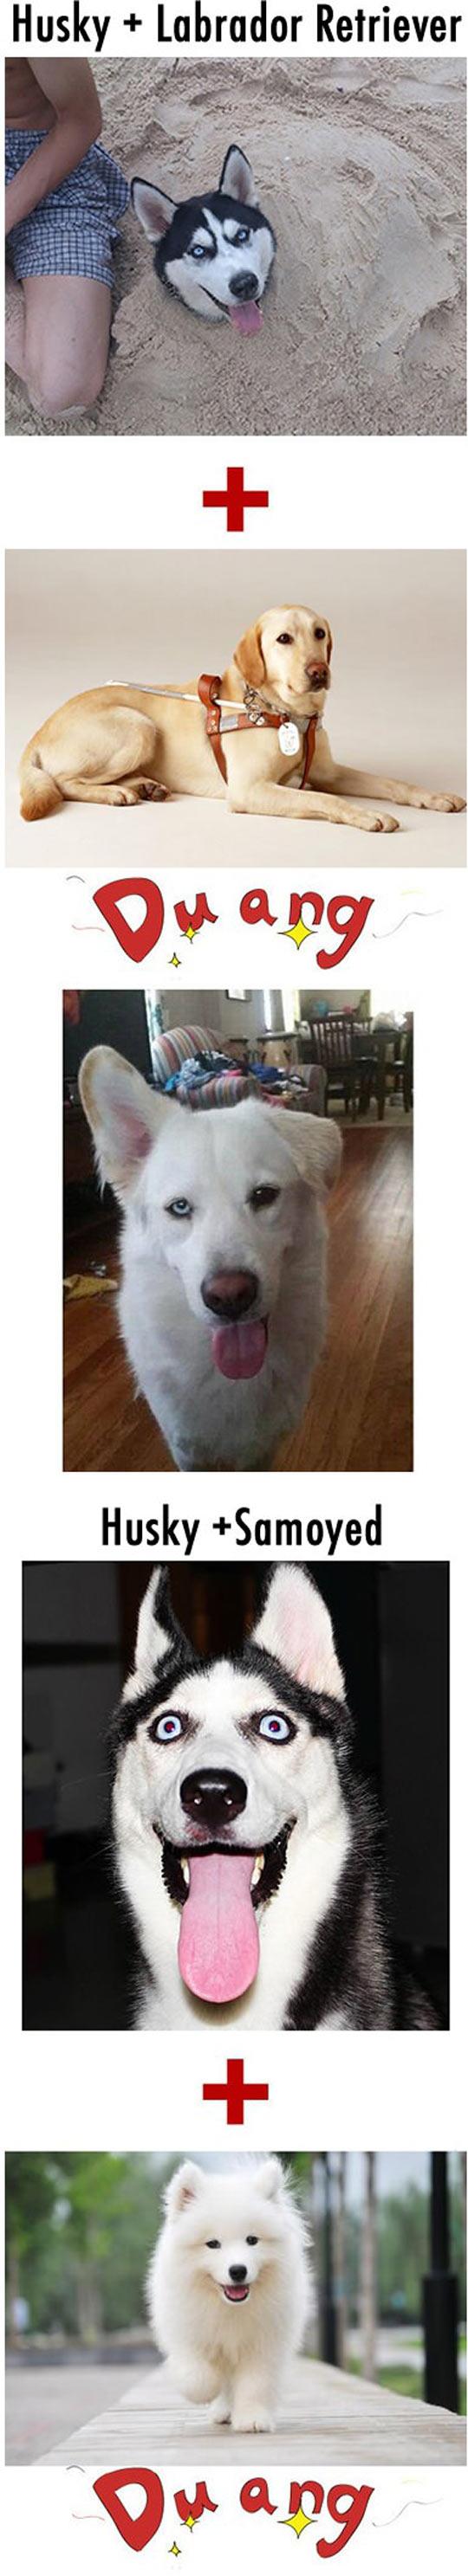 funny-Husky-hybrid-Labrador-Retriever